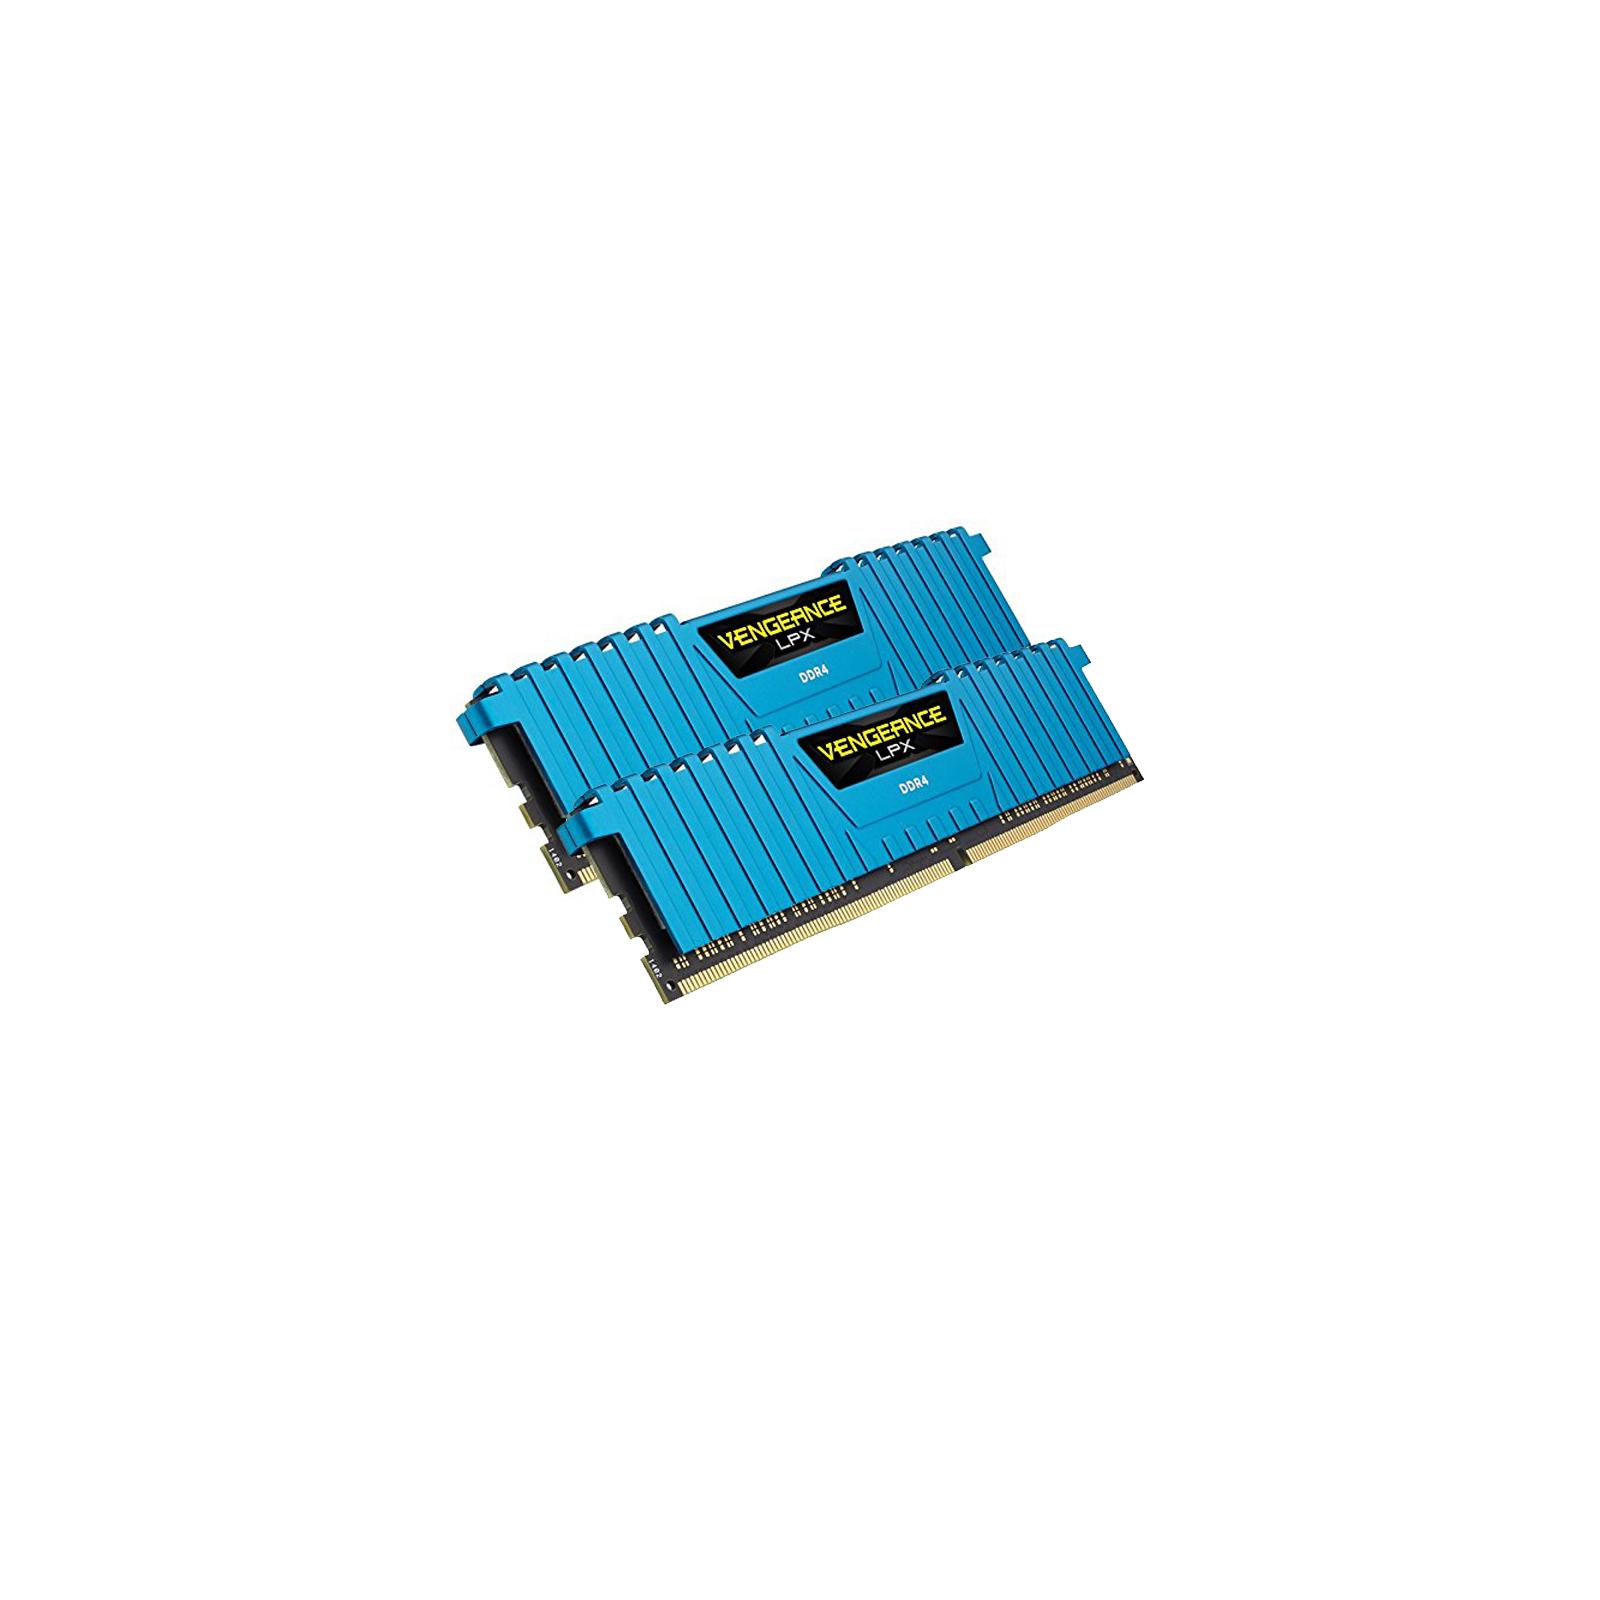 Модуль памяти для компьютера DDR4 16GB (2x8GB) 3000 MHz Vengeance LPX Blue Corsair (CMK16GX4M2B3000C15B) изображение 3